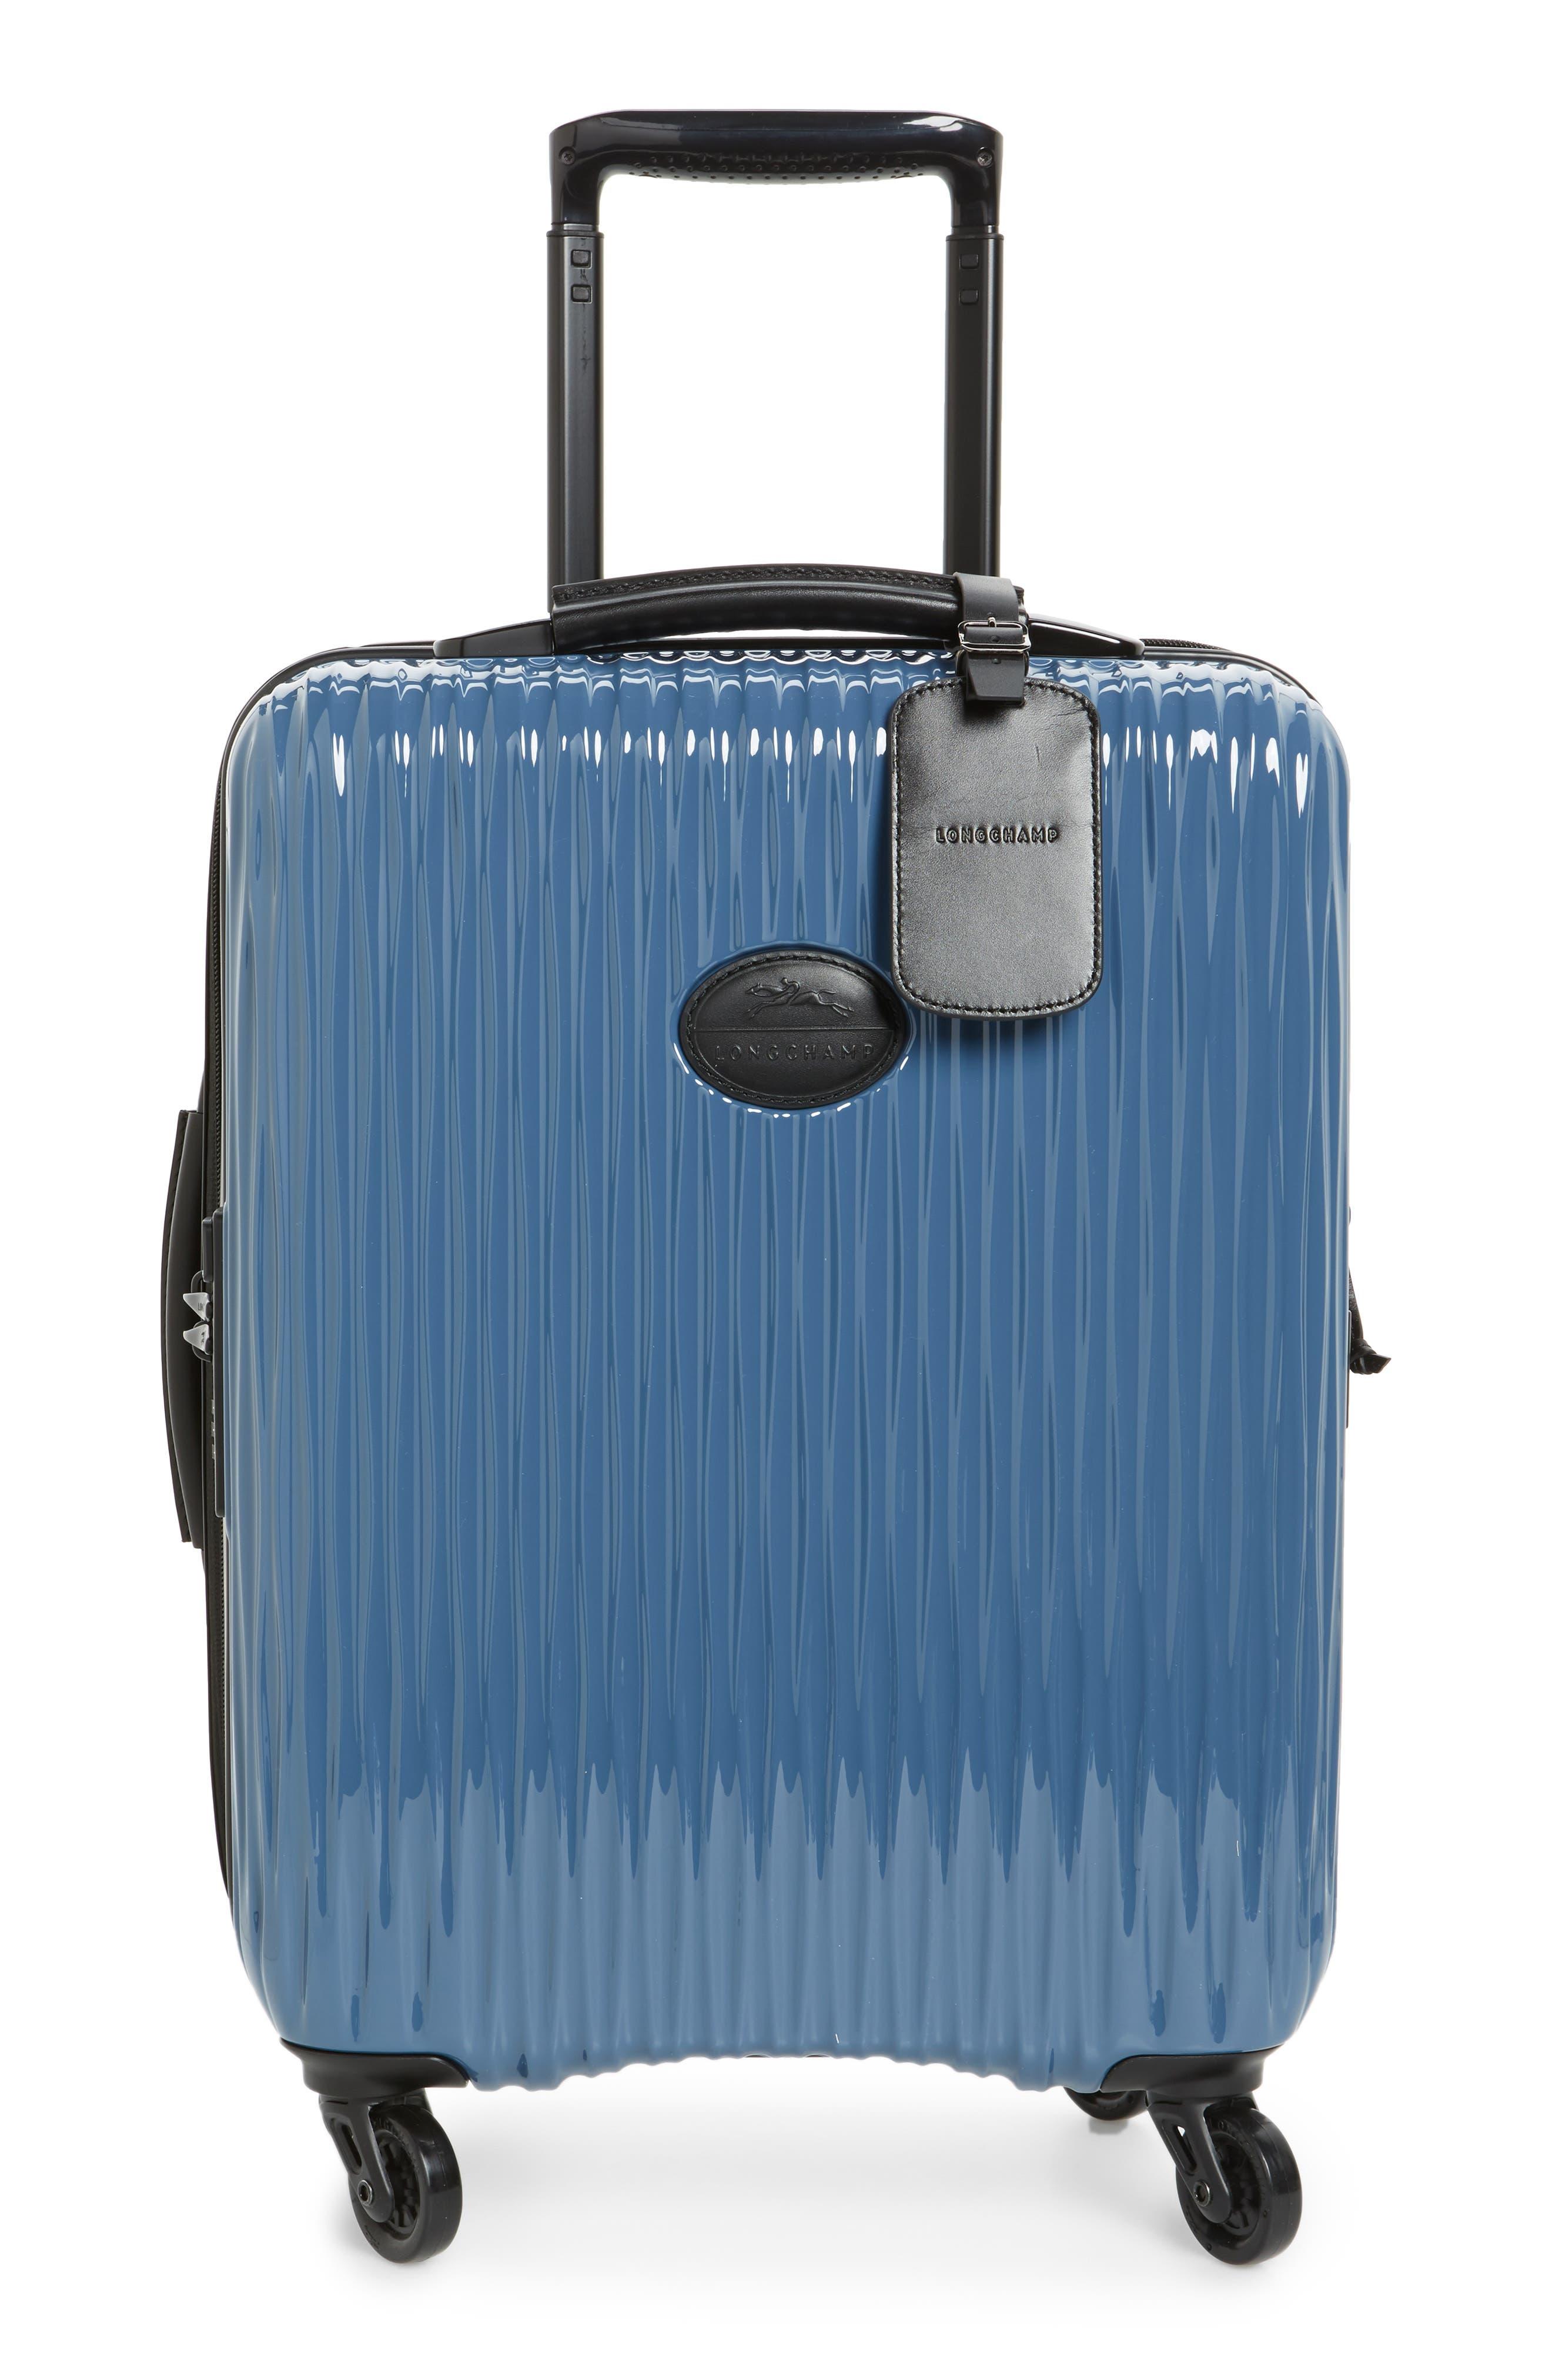 Main Image - Longchamp Ruban 22-Inch Four-Wheel Hard Shell Suitcase